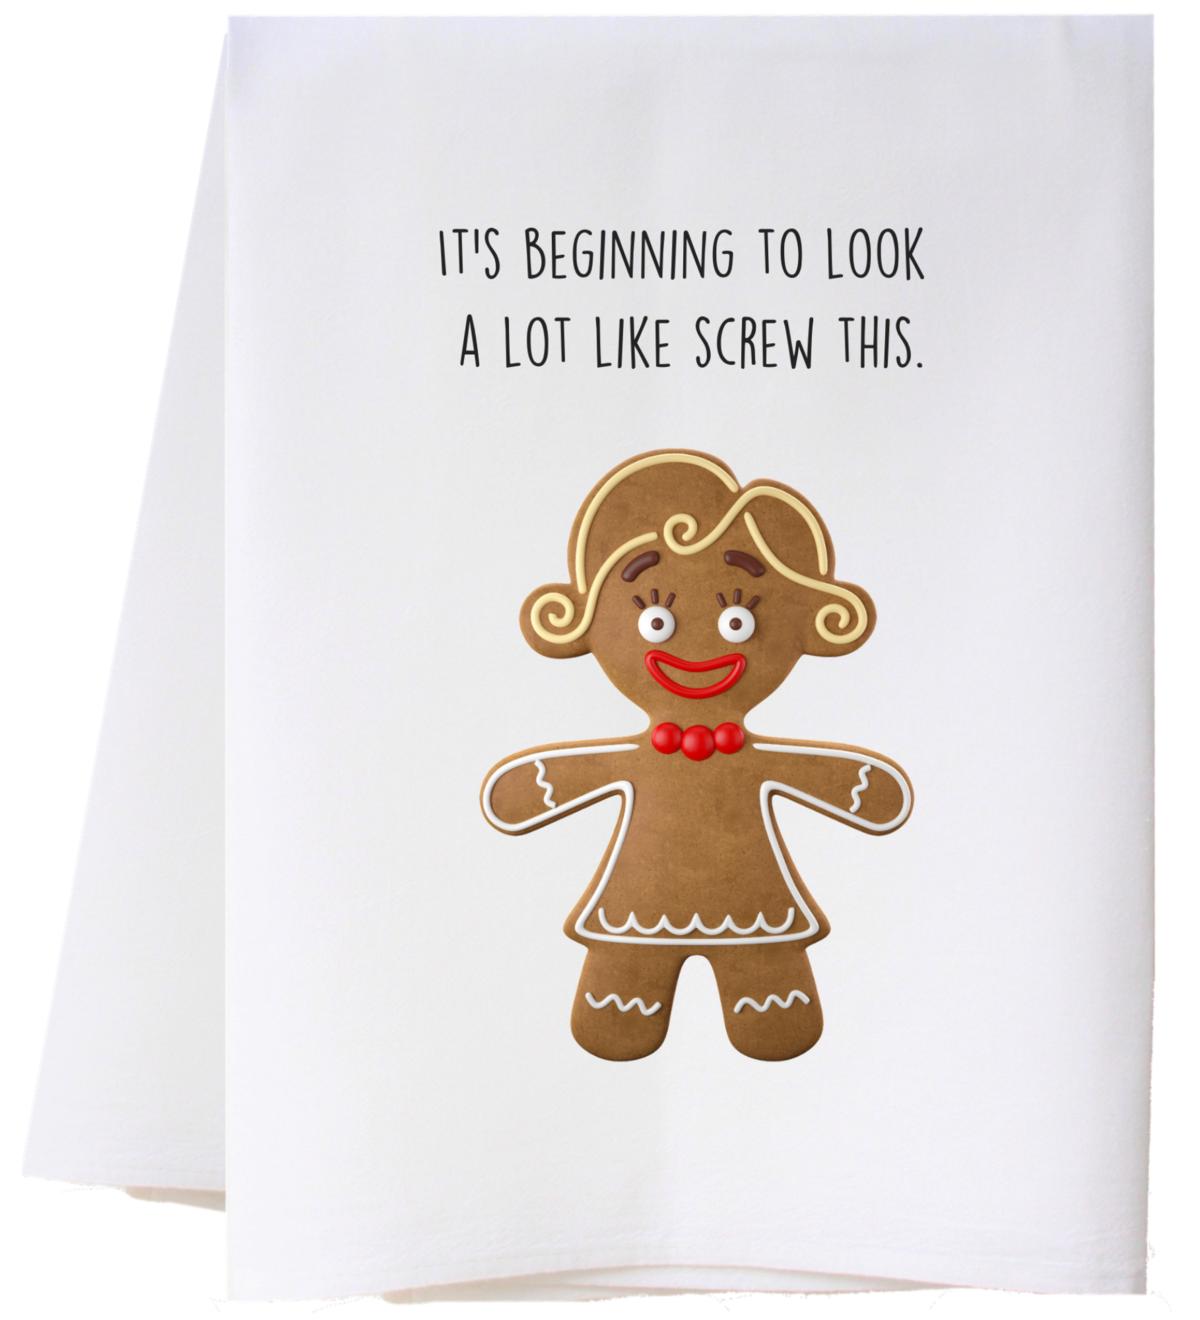 Southern Sisters Enterprises Screw This Flour Sack Towel